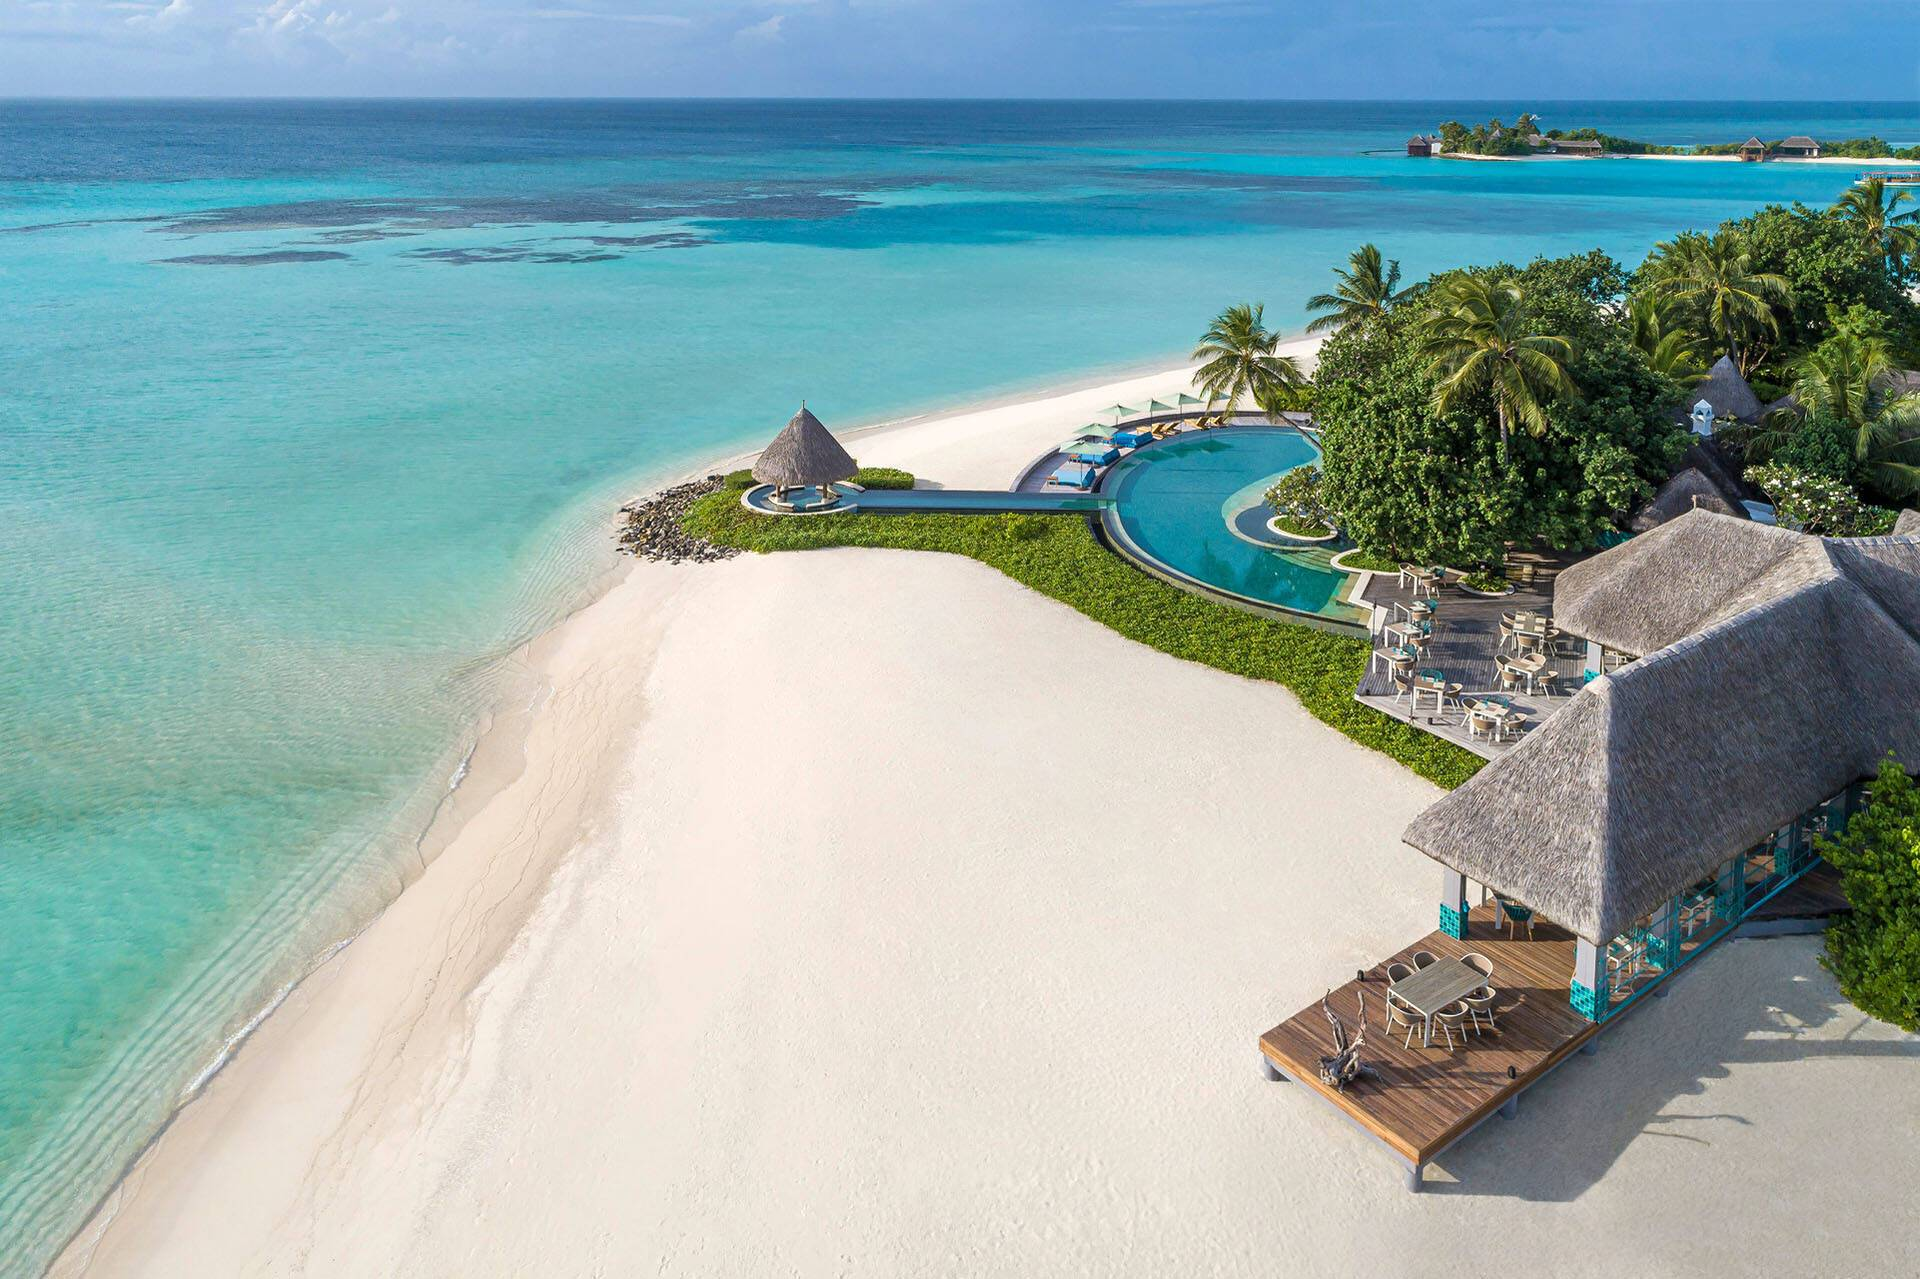 Four Seasons Kuda Huraa Maldives Plage